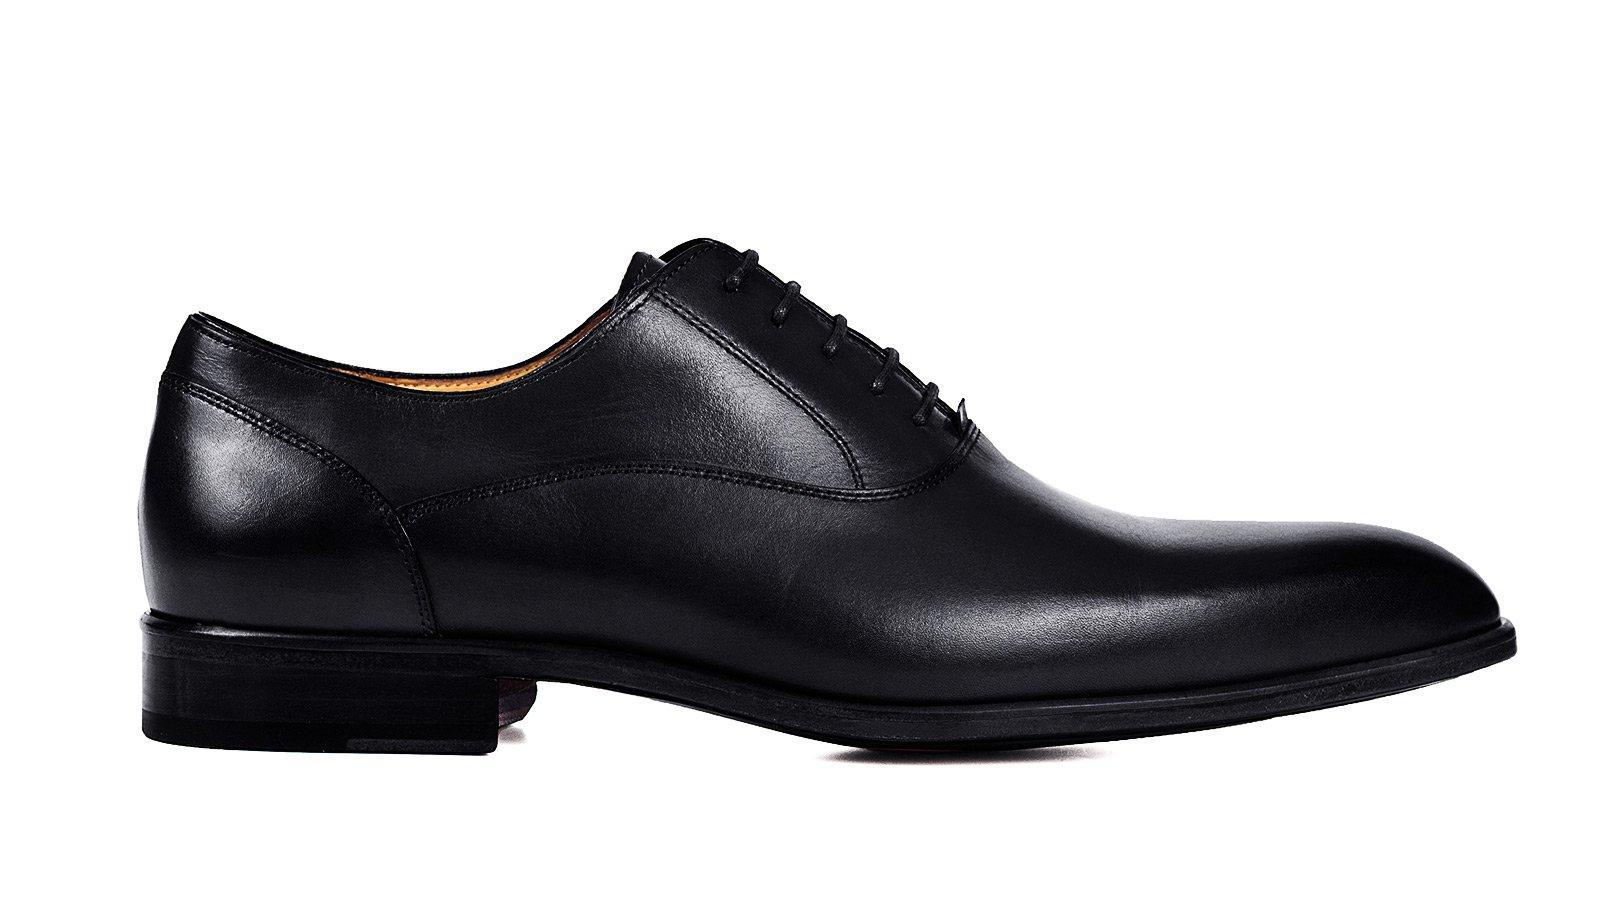 Black Plain-Toe Oxford - slider image 1